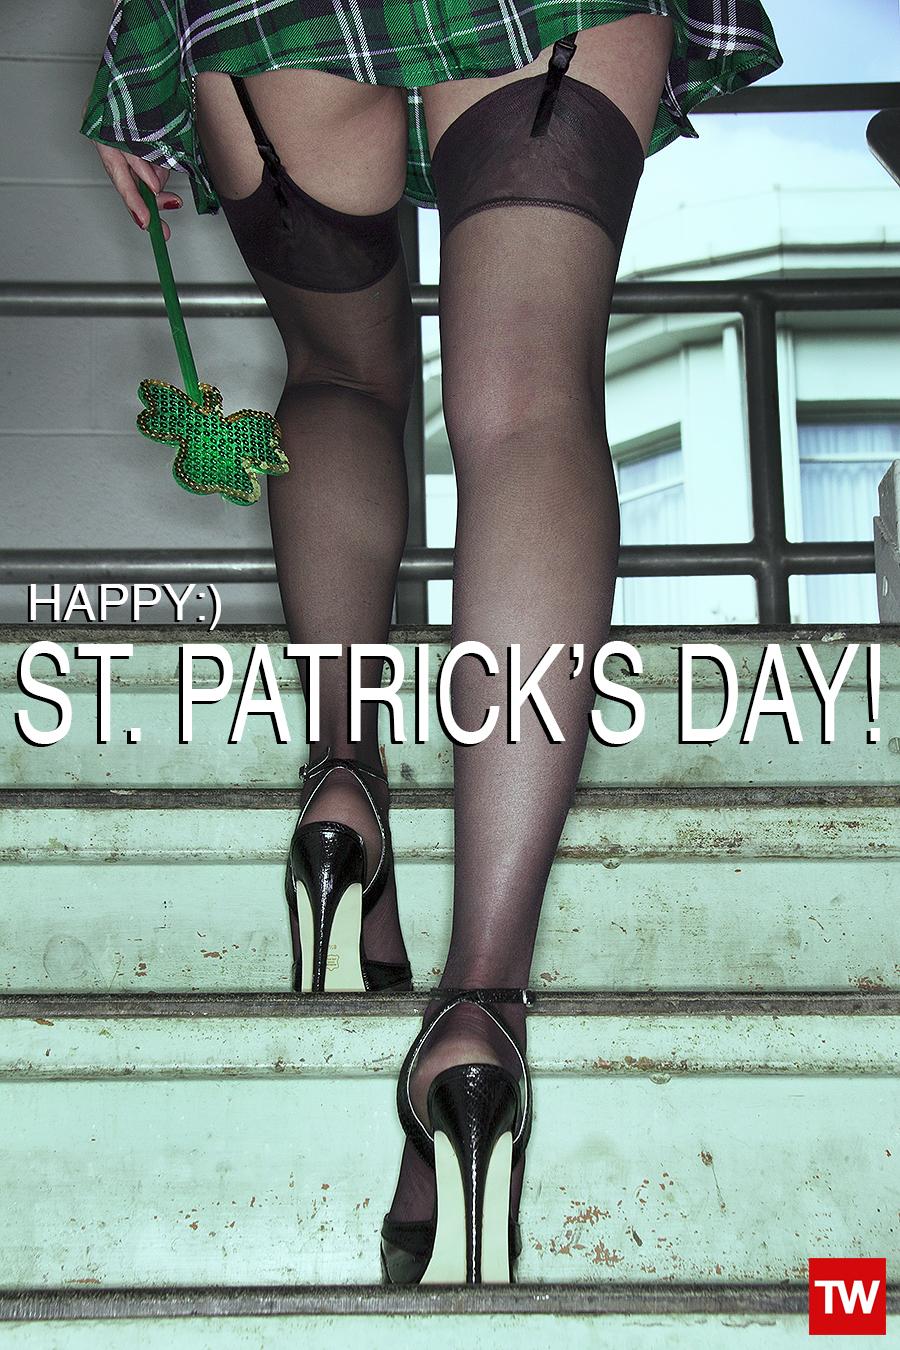 Tony_Ward_Studio_st_Patrick's_day_happy_legs_lingerie_green_sexy_outfits_shamarocks